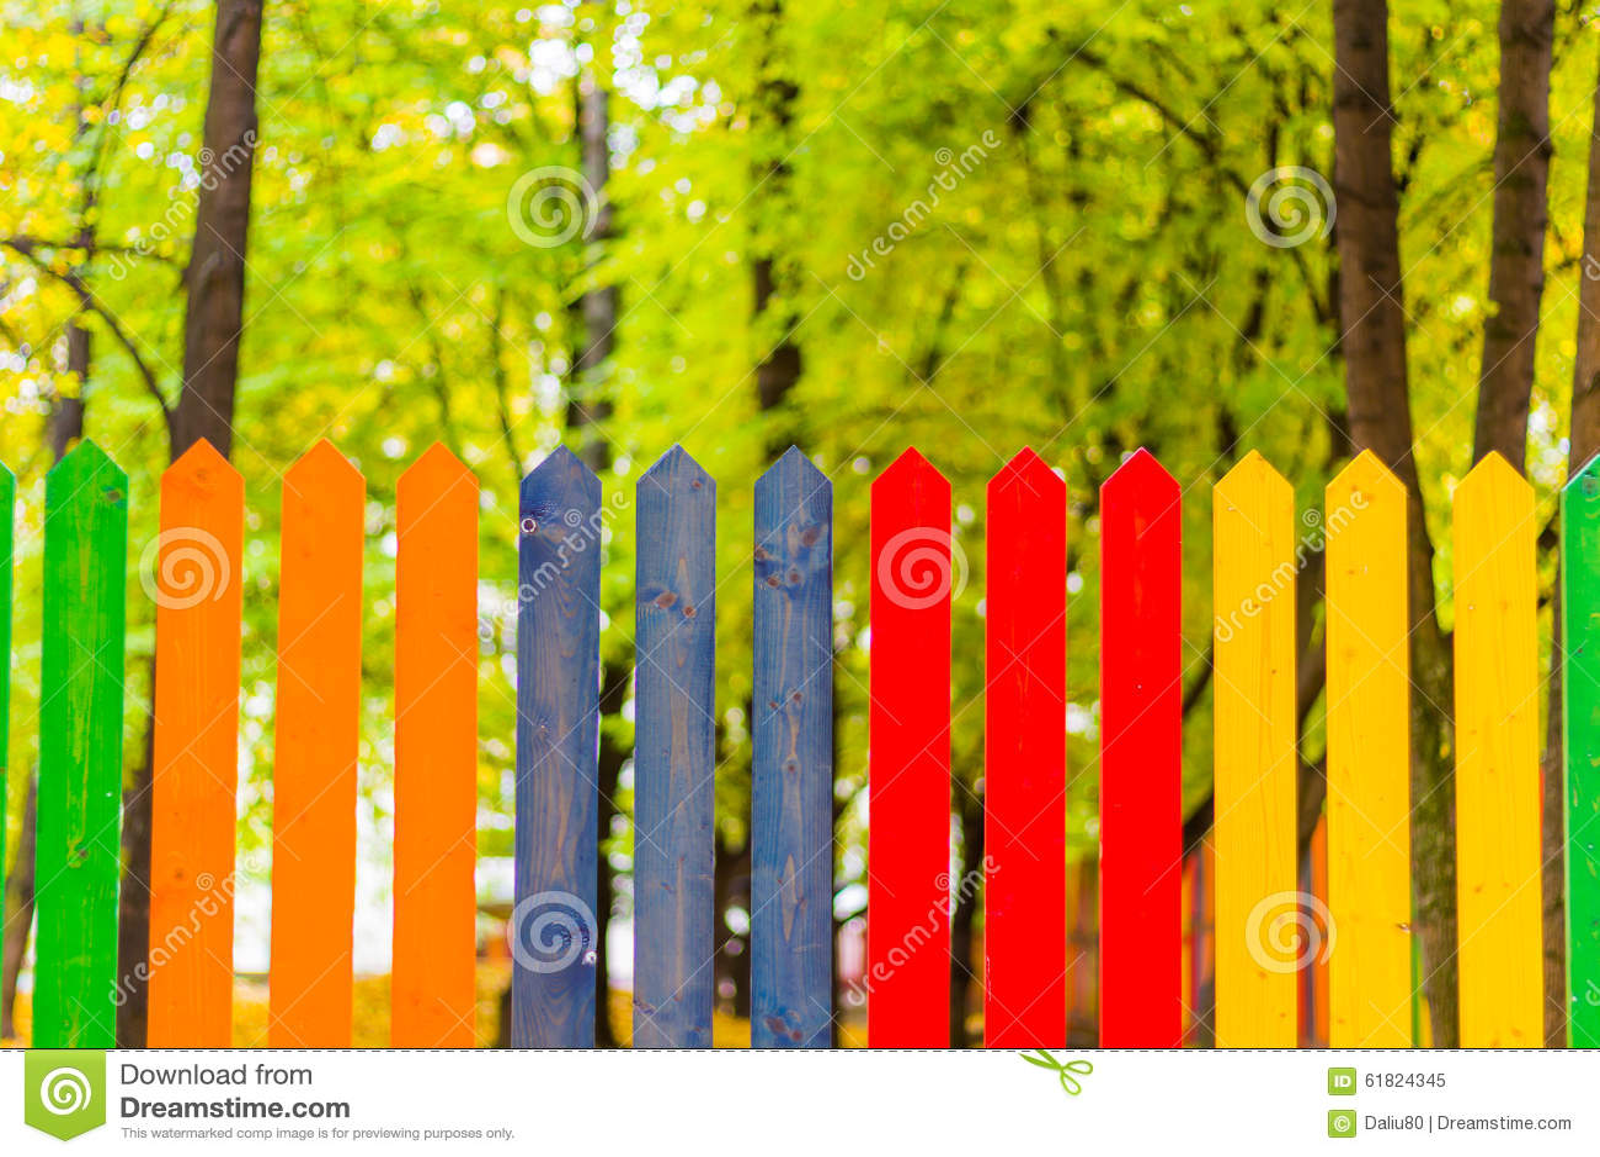 Multi colored rainbow wooden fence in autumn garden